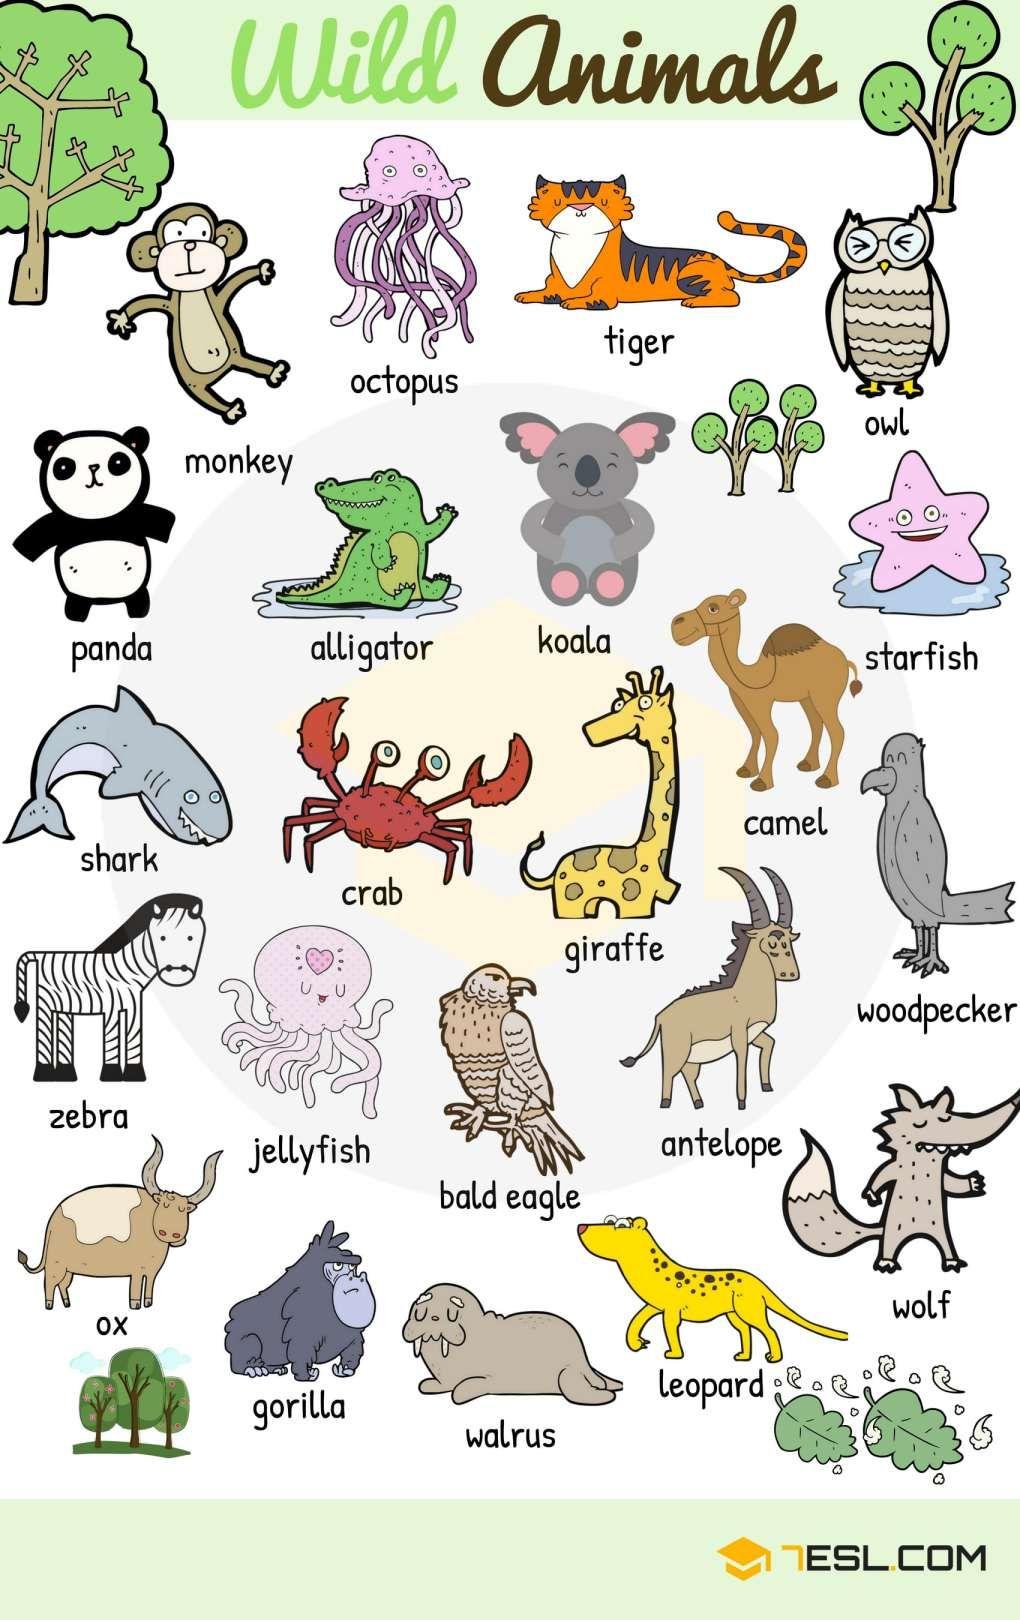 Learn Animal Names in English สัตว์ กิจกรรมเด็กก่อนวัย